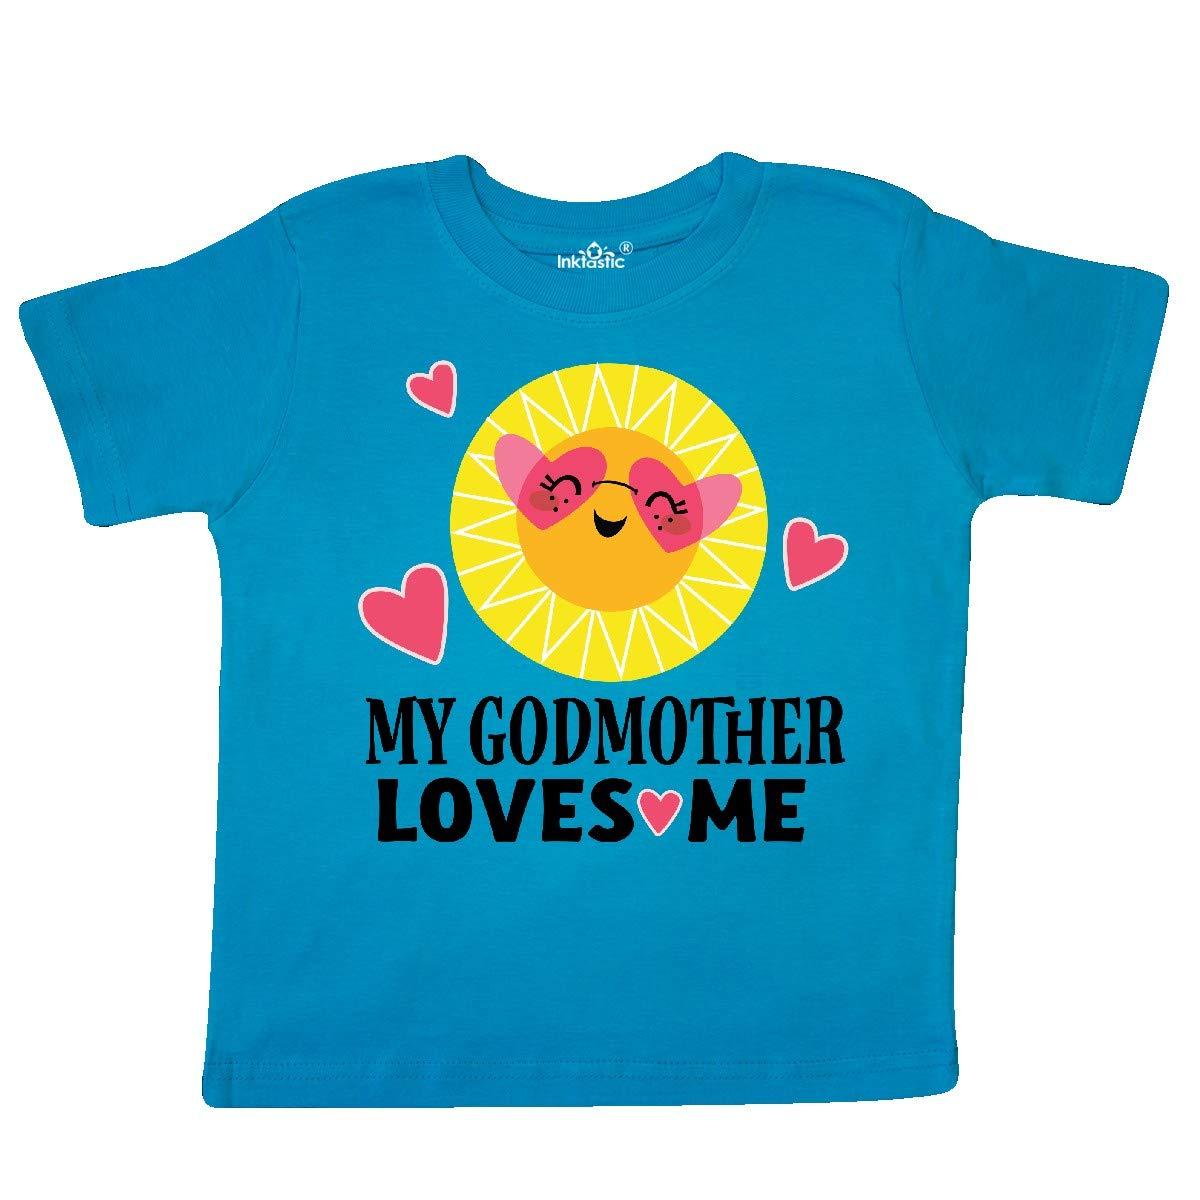 inktastic My Godmother Loves Me Girls Toddler T-Shirt